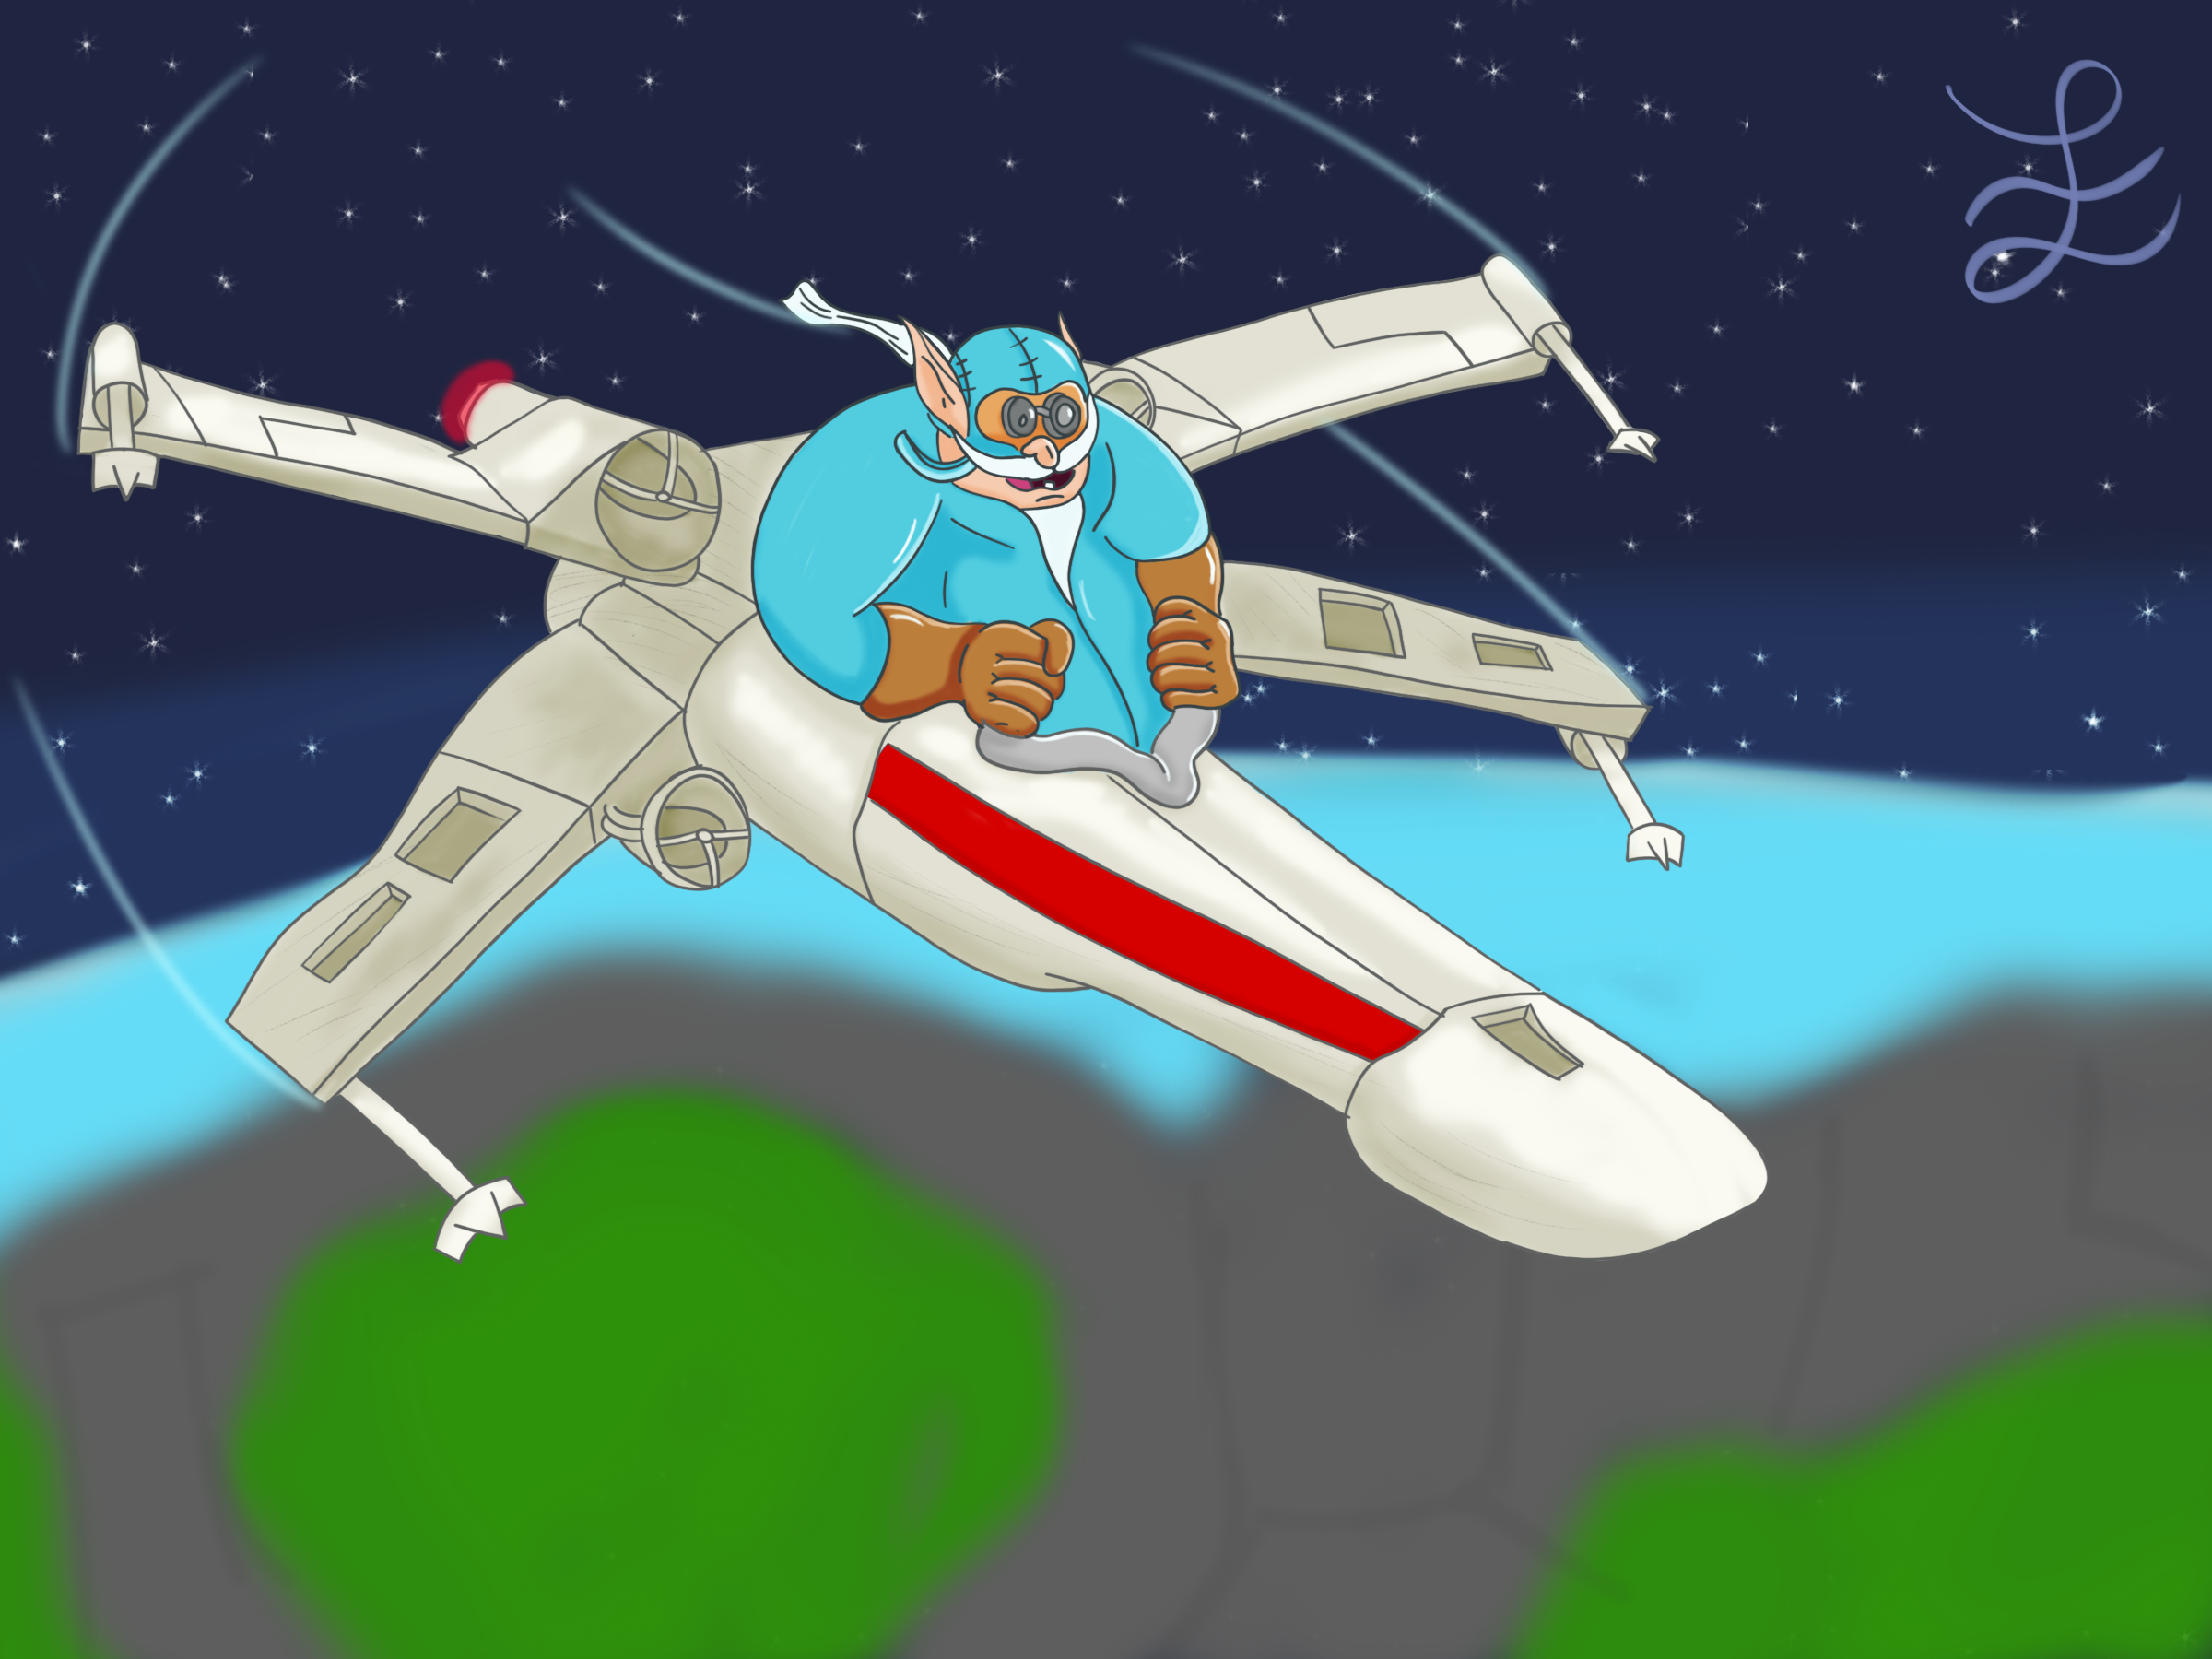 Gyro-X-wing